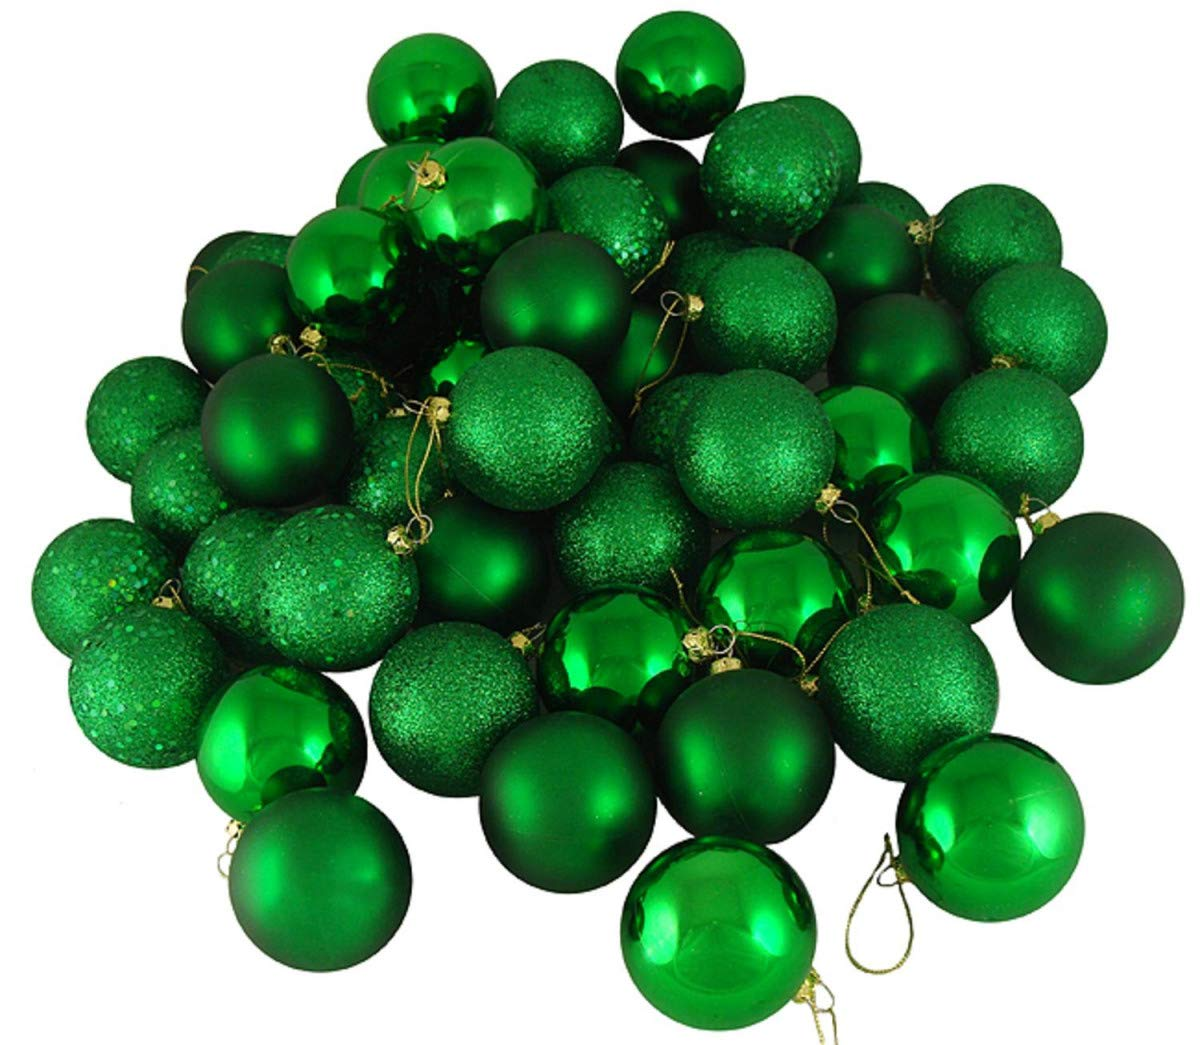 FLAMINGO_STORE Christmas Ball Ornament Xmas Green Shatterproof 4-Finish Christmas Ball Ornaments 2.5'' (60mm) 24ct Xmas Green Shatterproof 4-Finish Christmas Ball Ornaments 2.5'' (60mm)